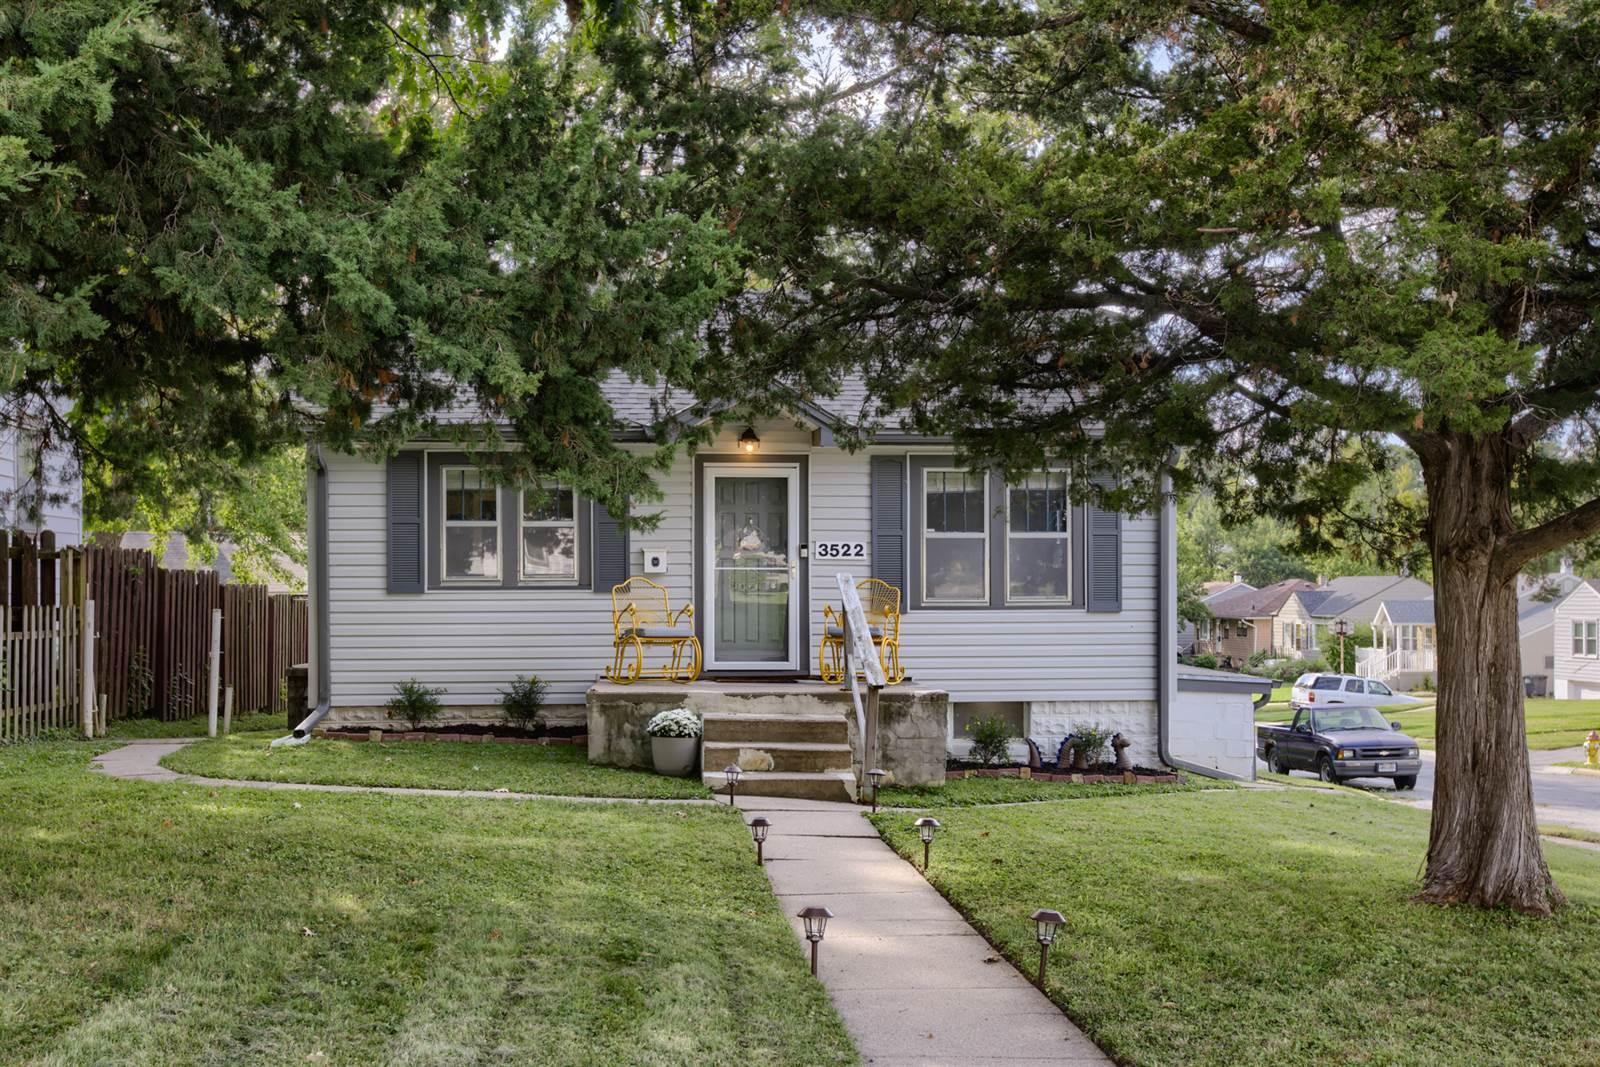 3522 North 61 Street, Omaha, NE 68104